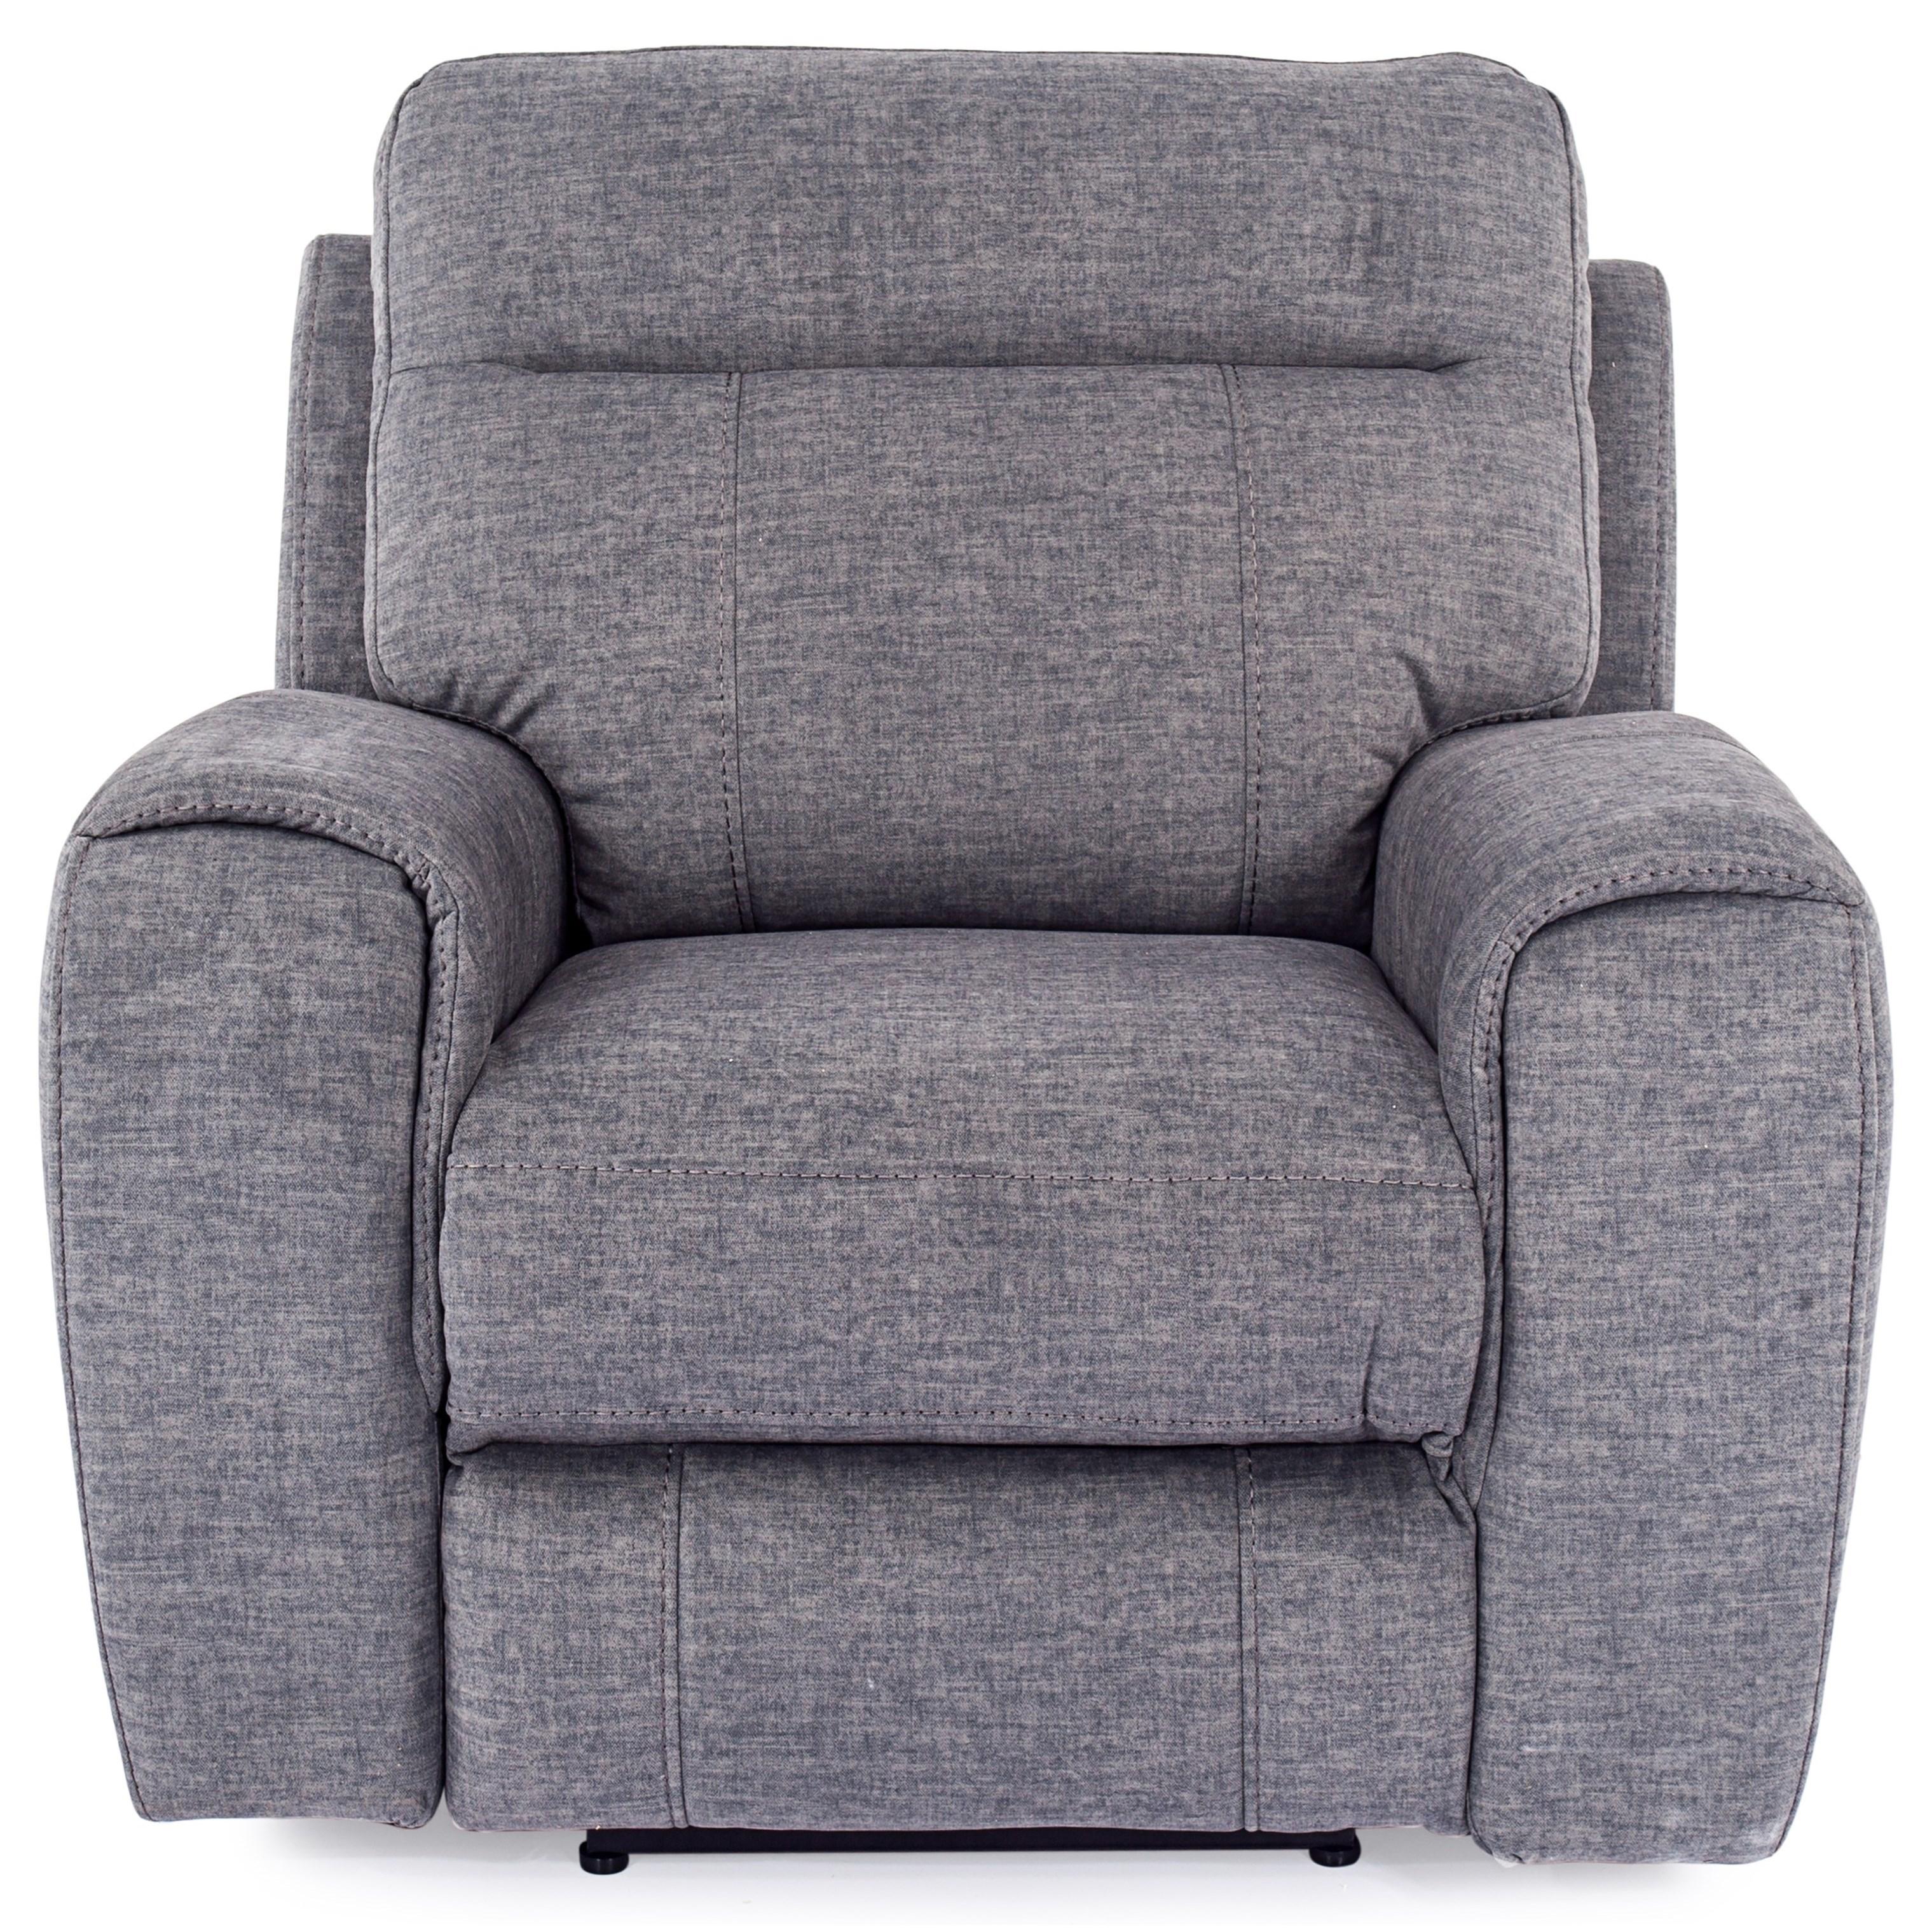 9868 Power Recliner w/ Power Headrest at Pilgrim Furniture City